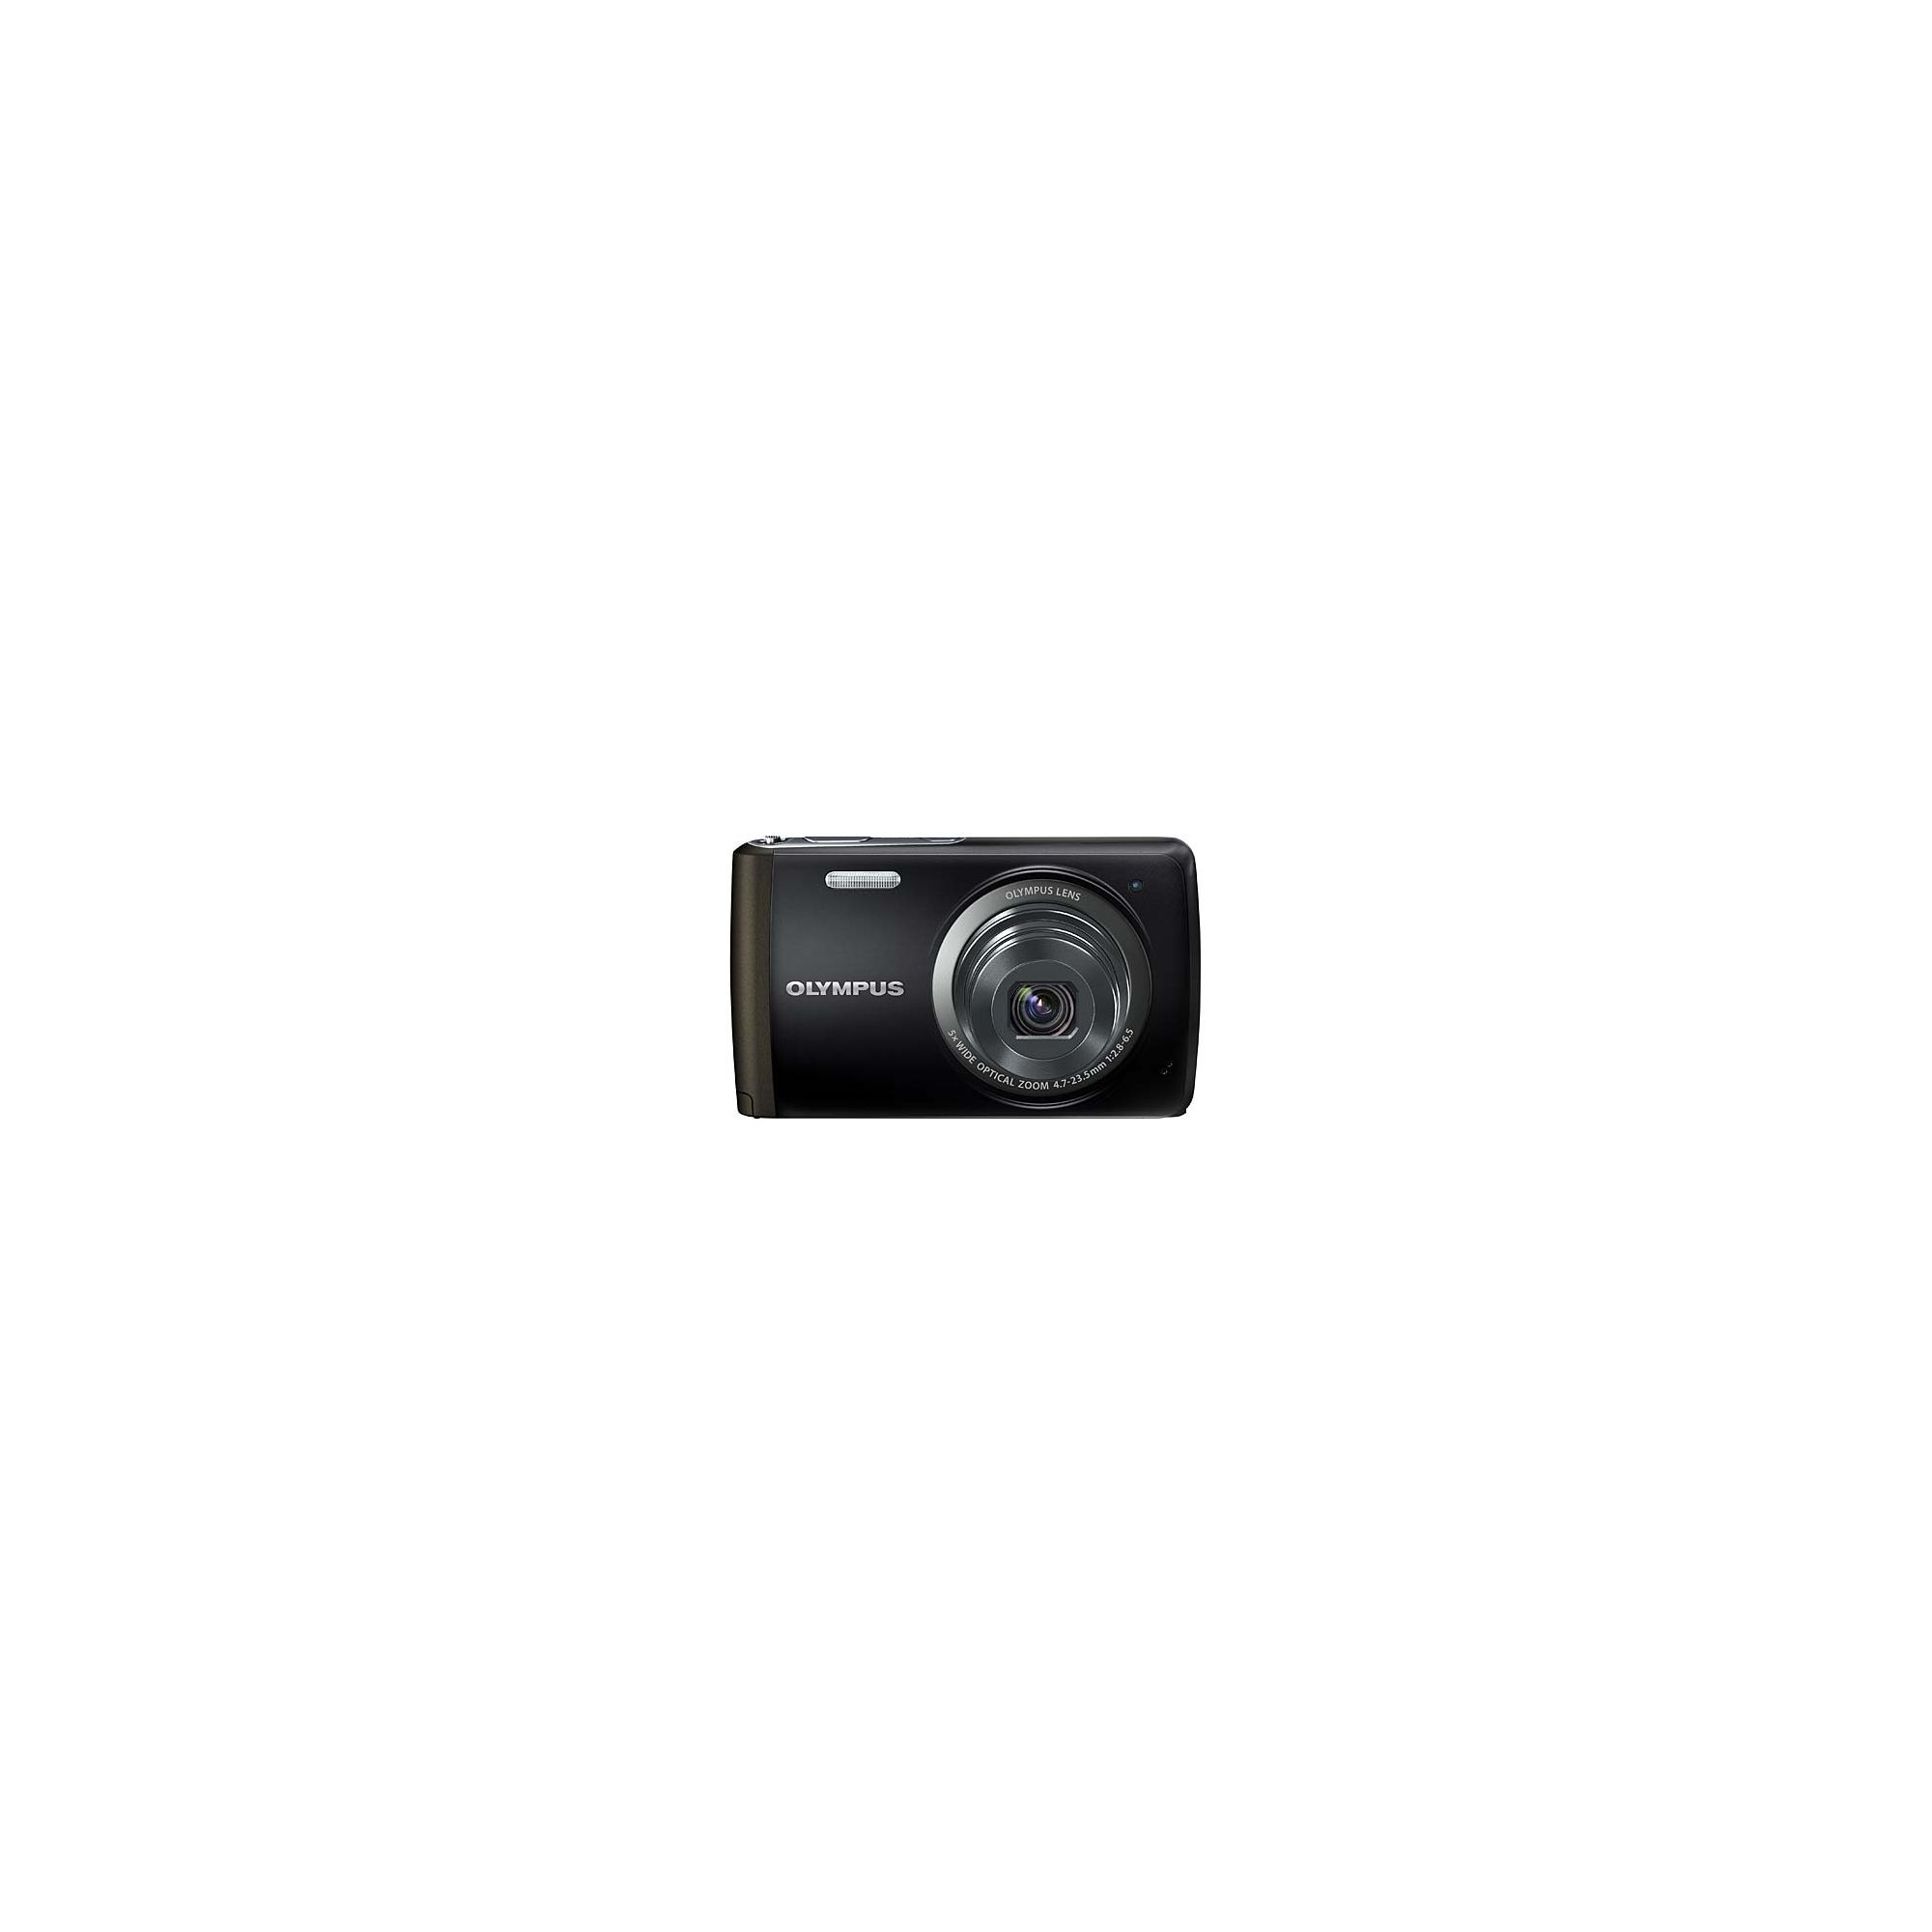 Olympus Vh-410 Digital Camera (Black)